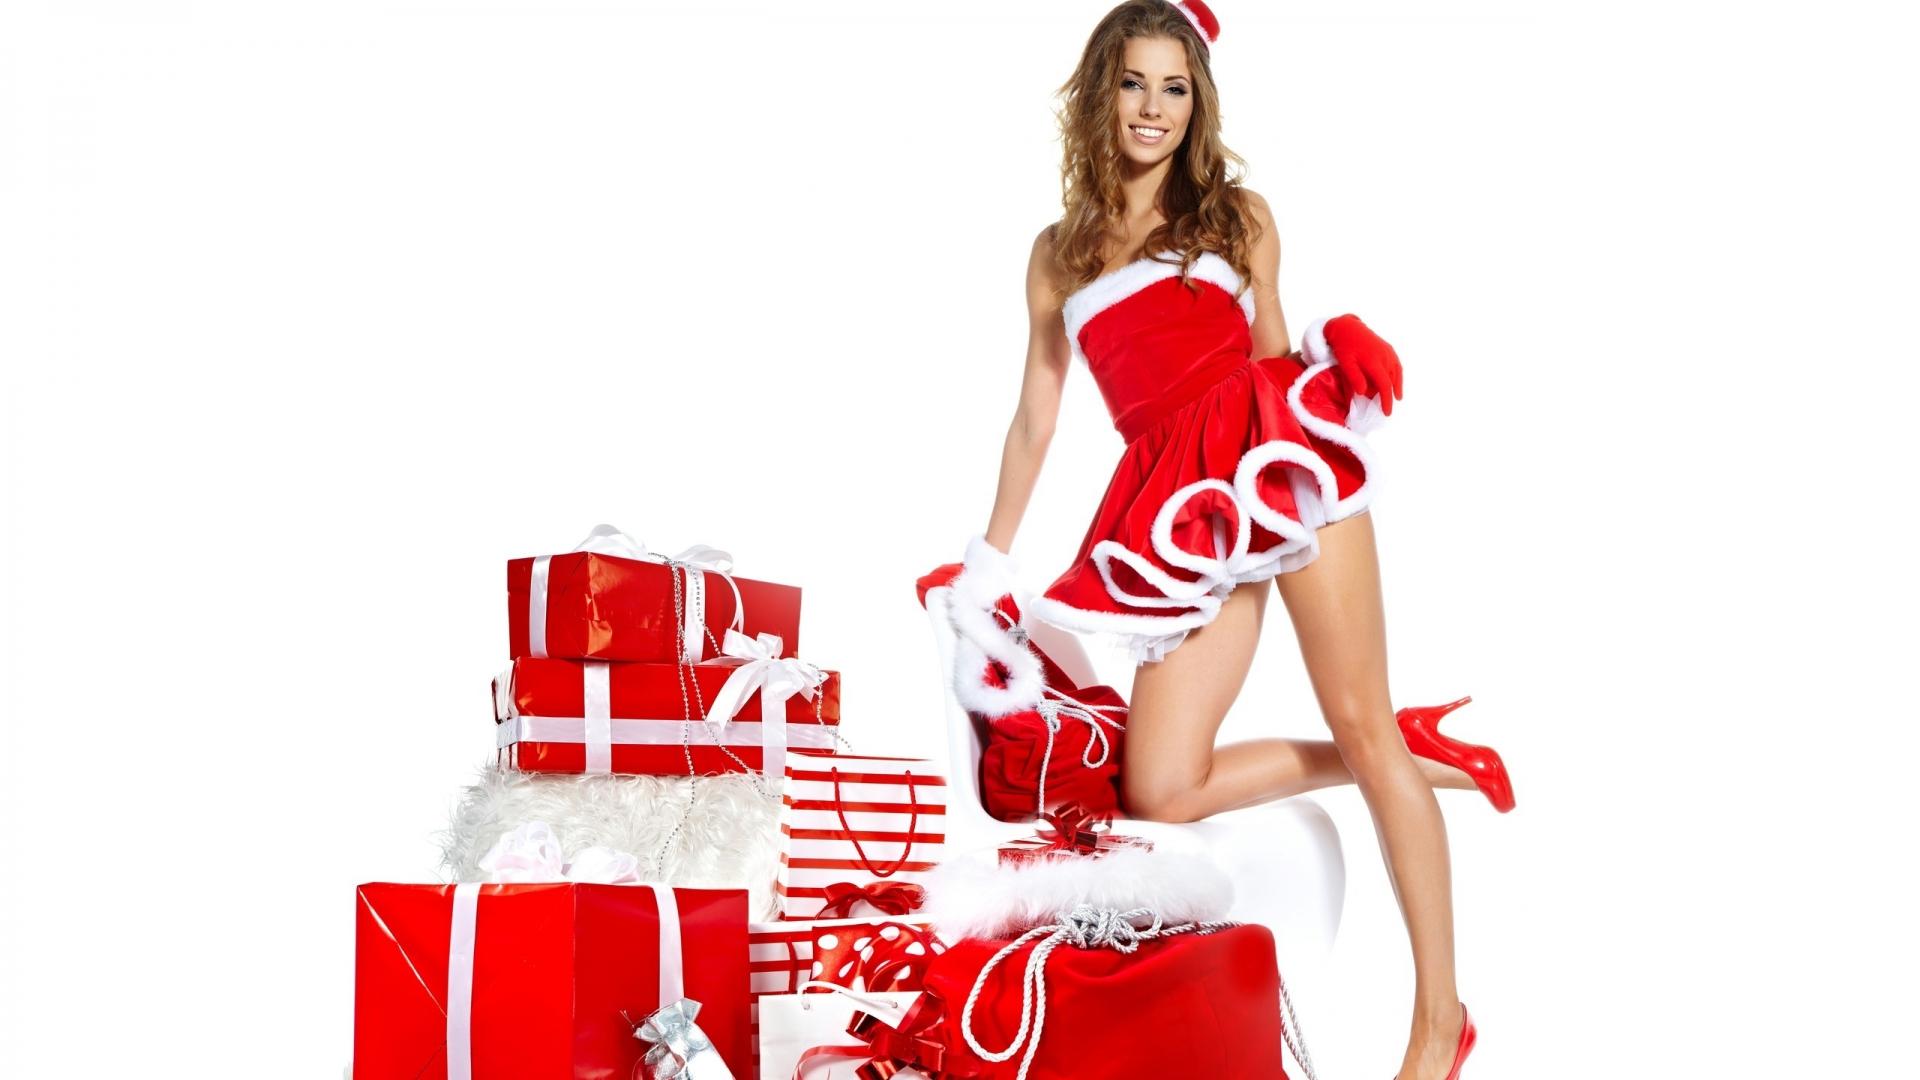 Babe Hd lovely santa babe hd wallpaper - wallpaperfx